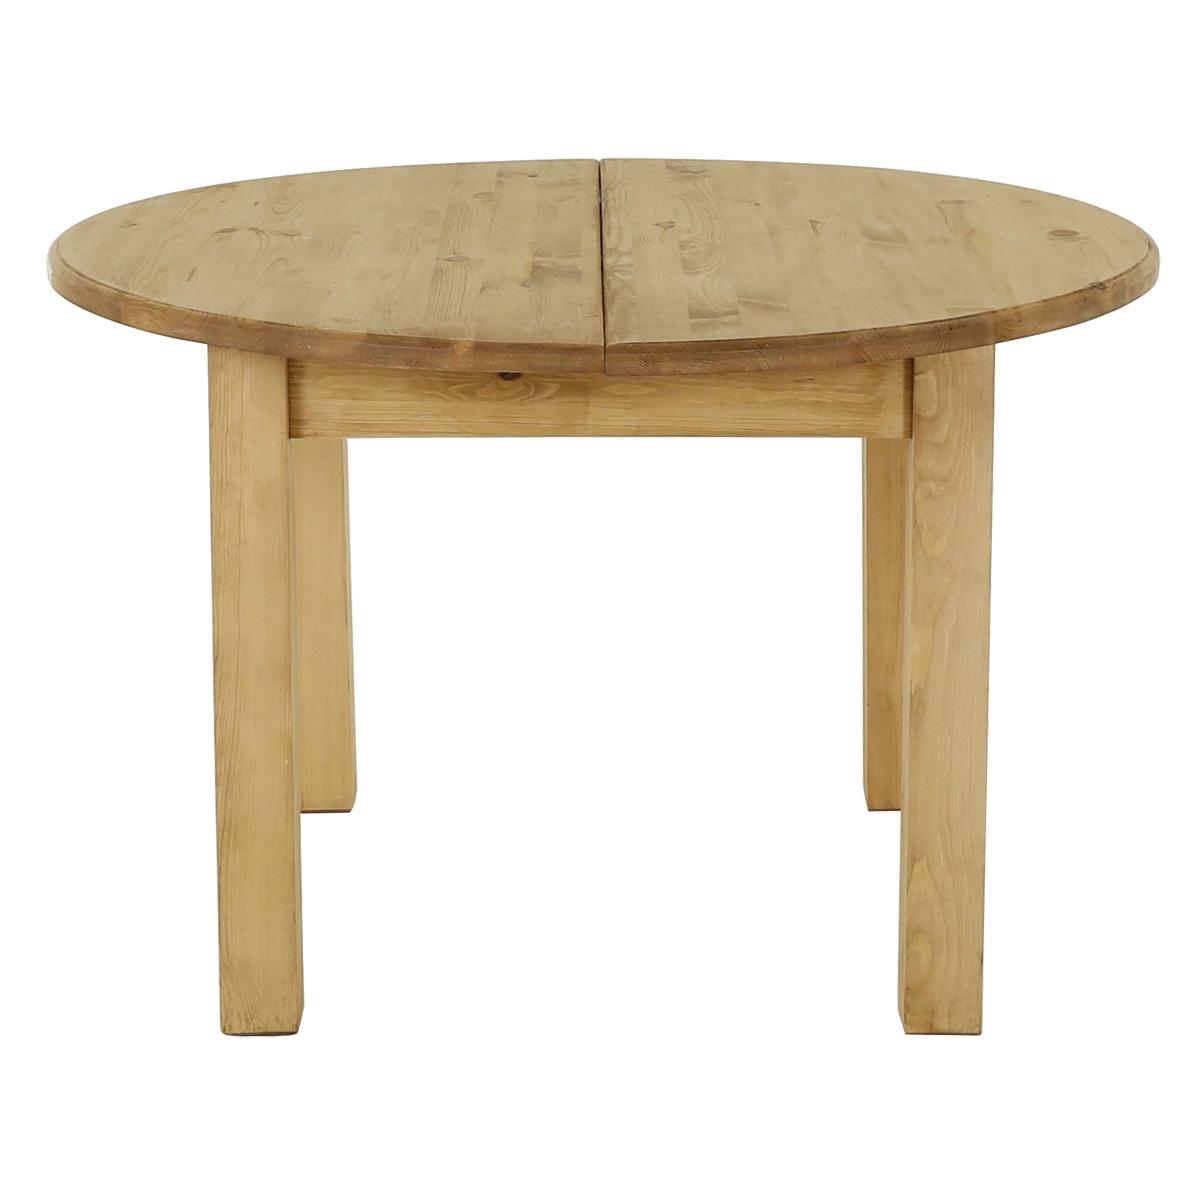 Table ronde rustique en pin massif 120 cm + rallonge 40 cm